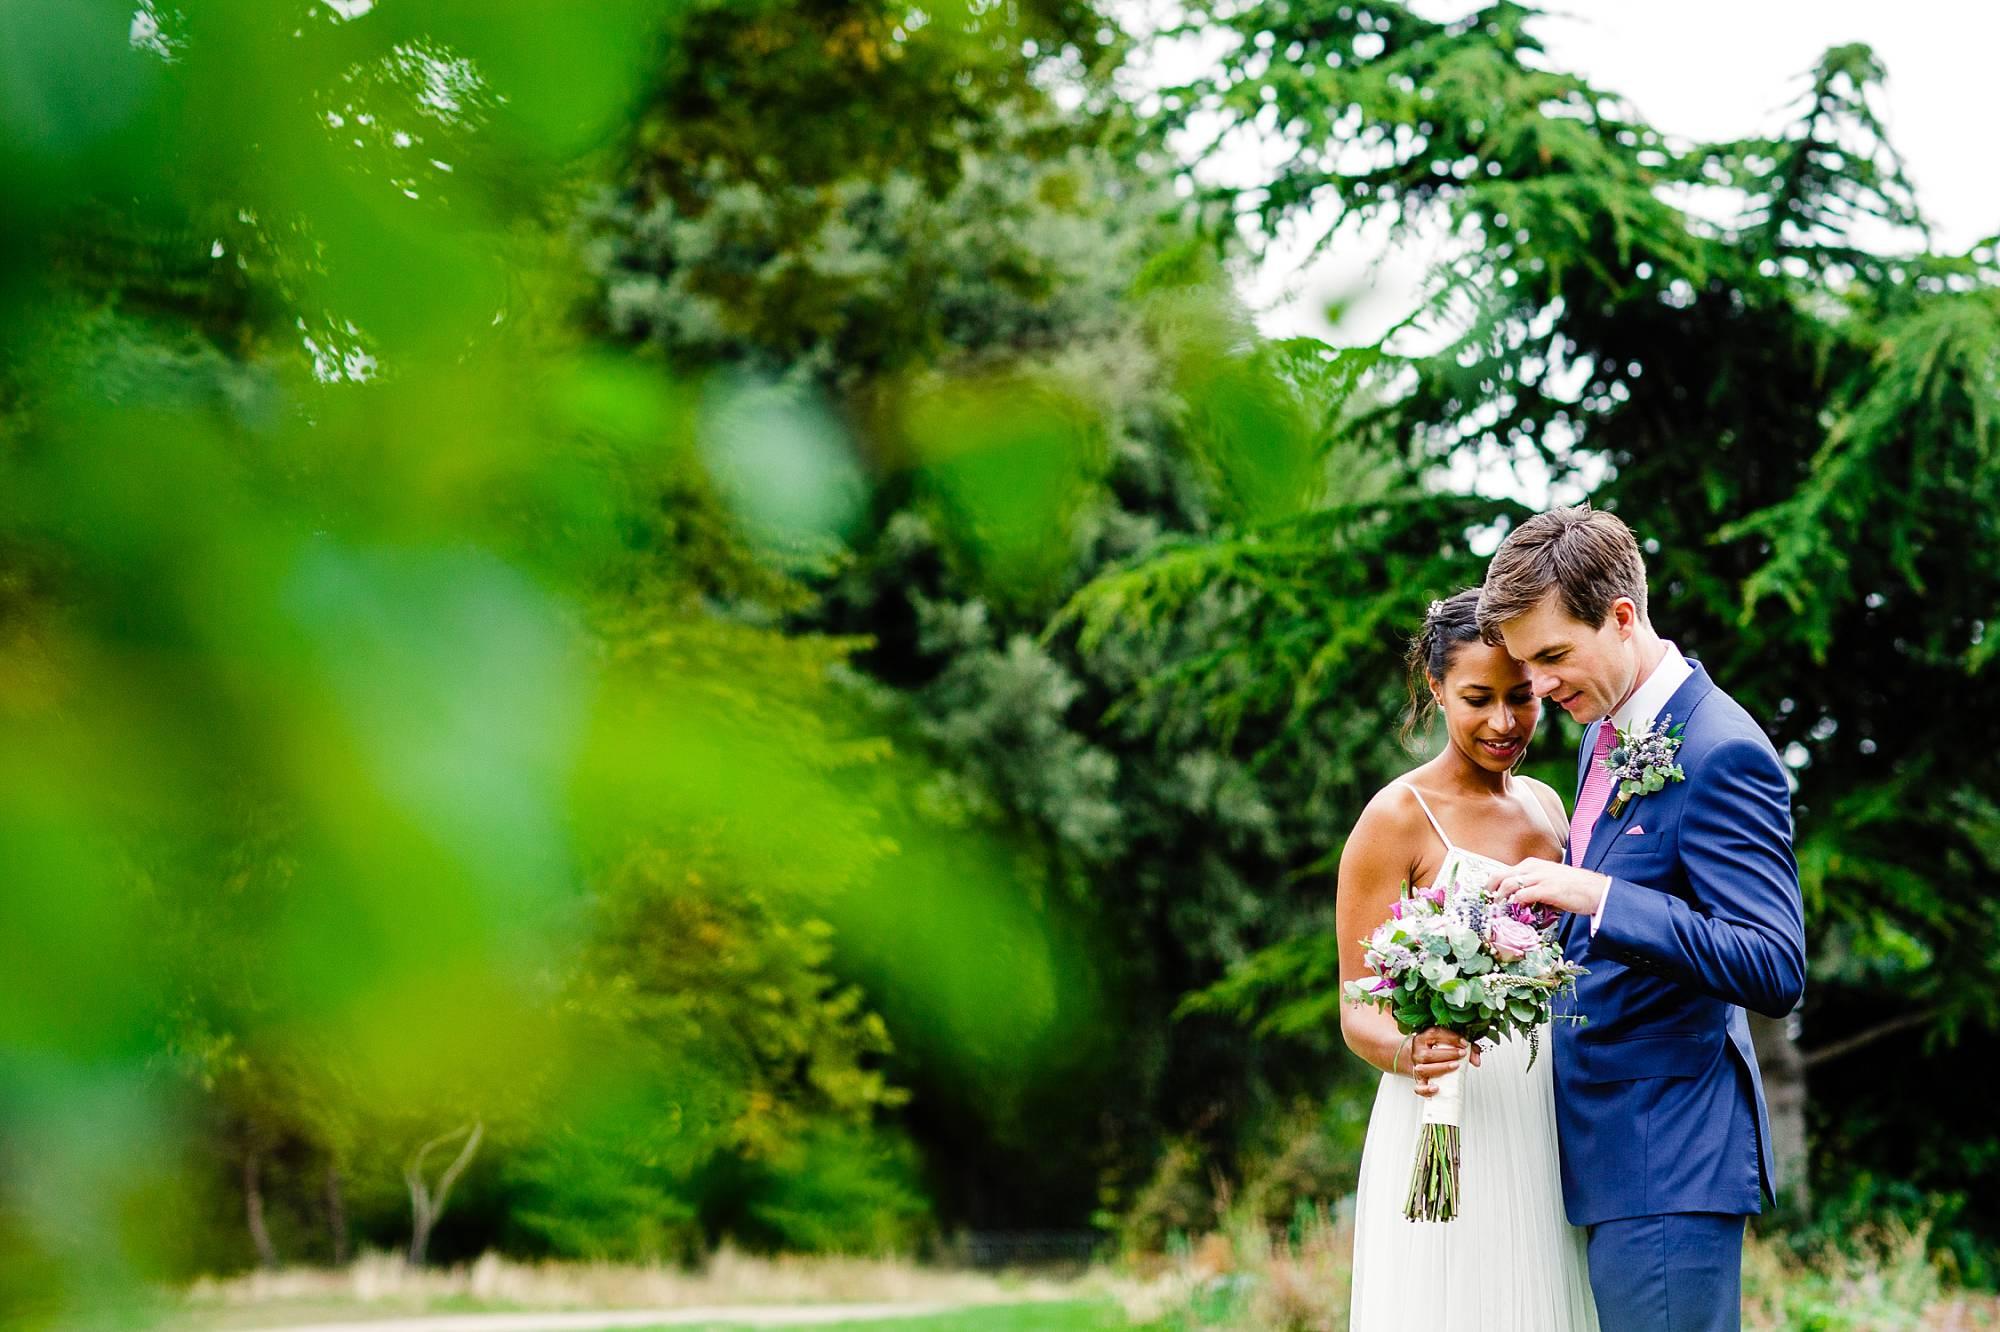 The Old Church London Wedding Photographer_0061.jpg